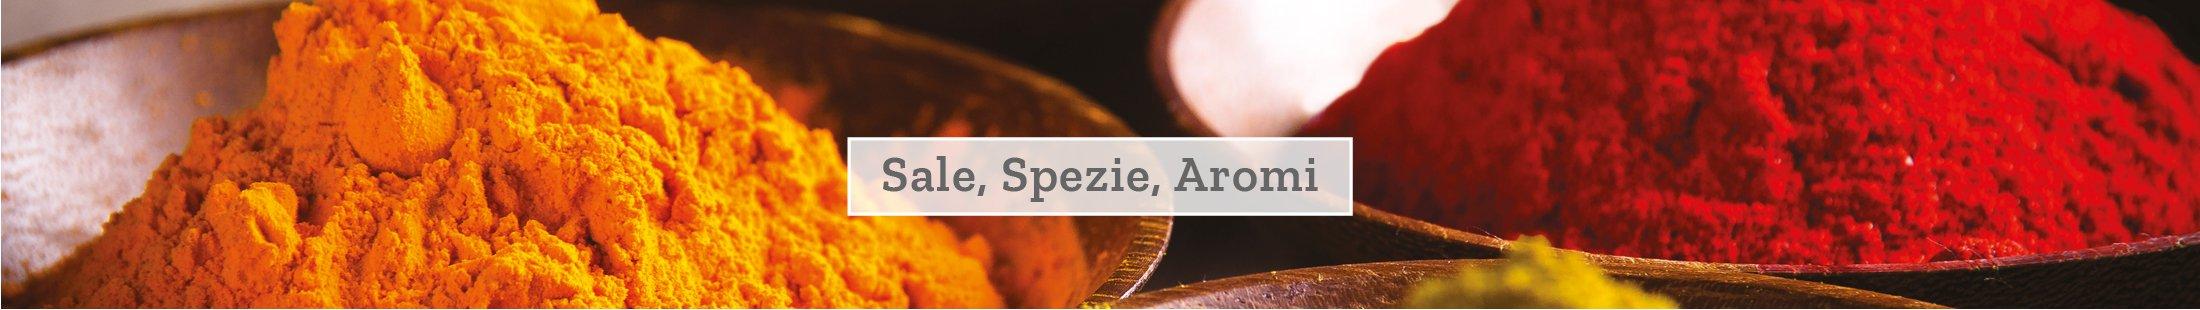 Sale spezie e aromi